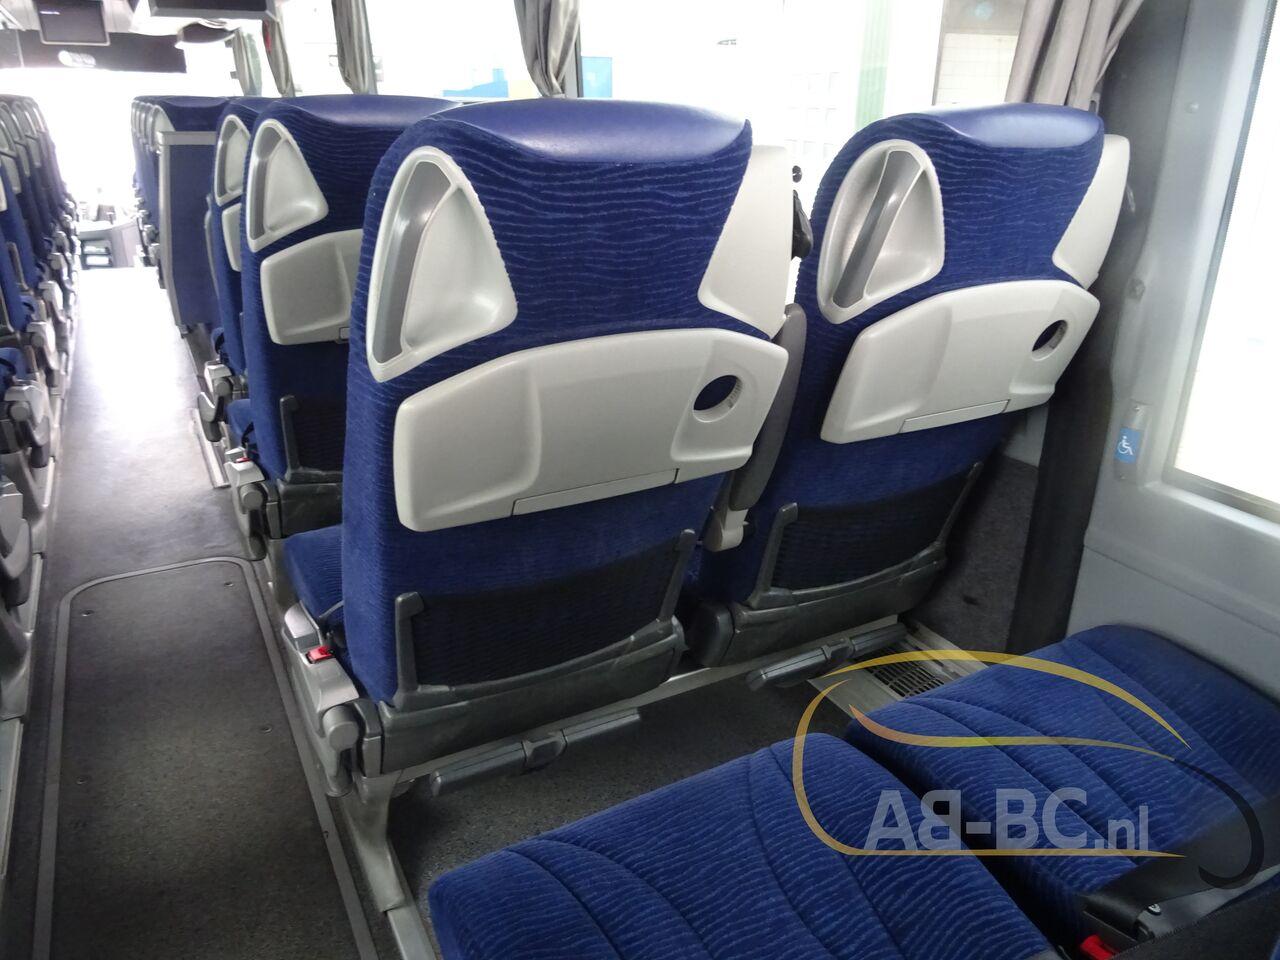 coach-busSETRA-S415-GT-HD-FINAL-EDITION---1627457298502138778_big_eedb65f7bff369298e88de361fa4628d--21050713010665719300